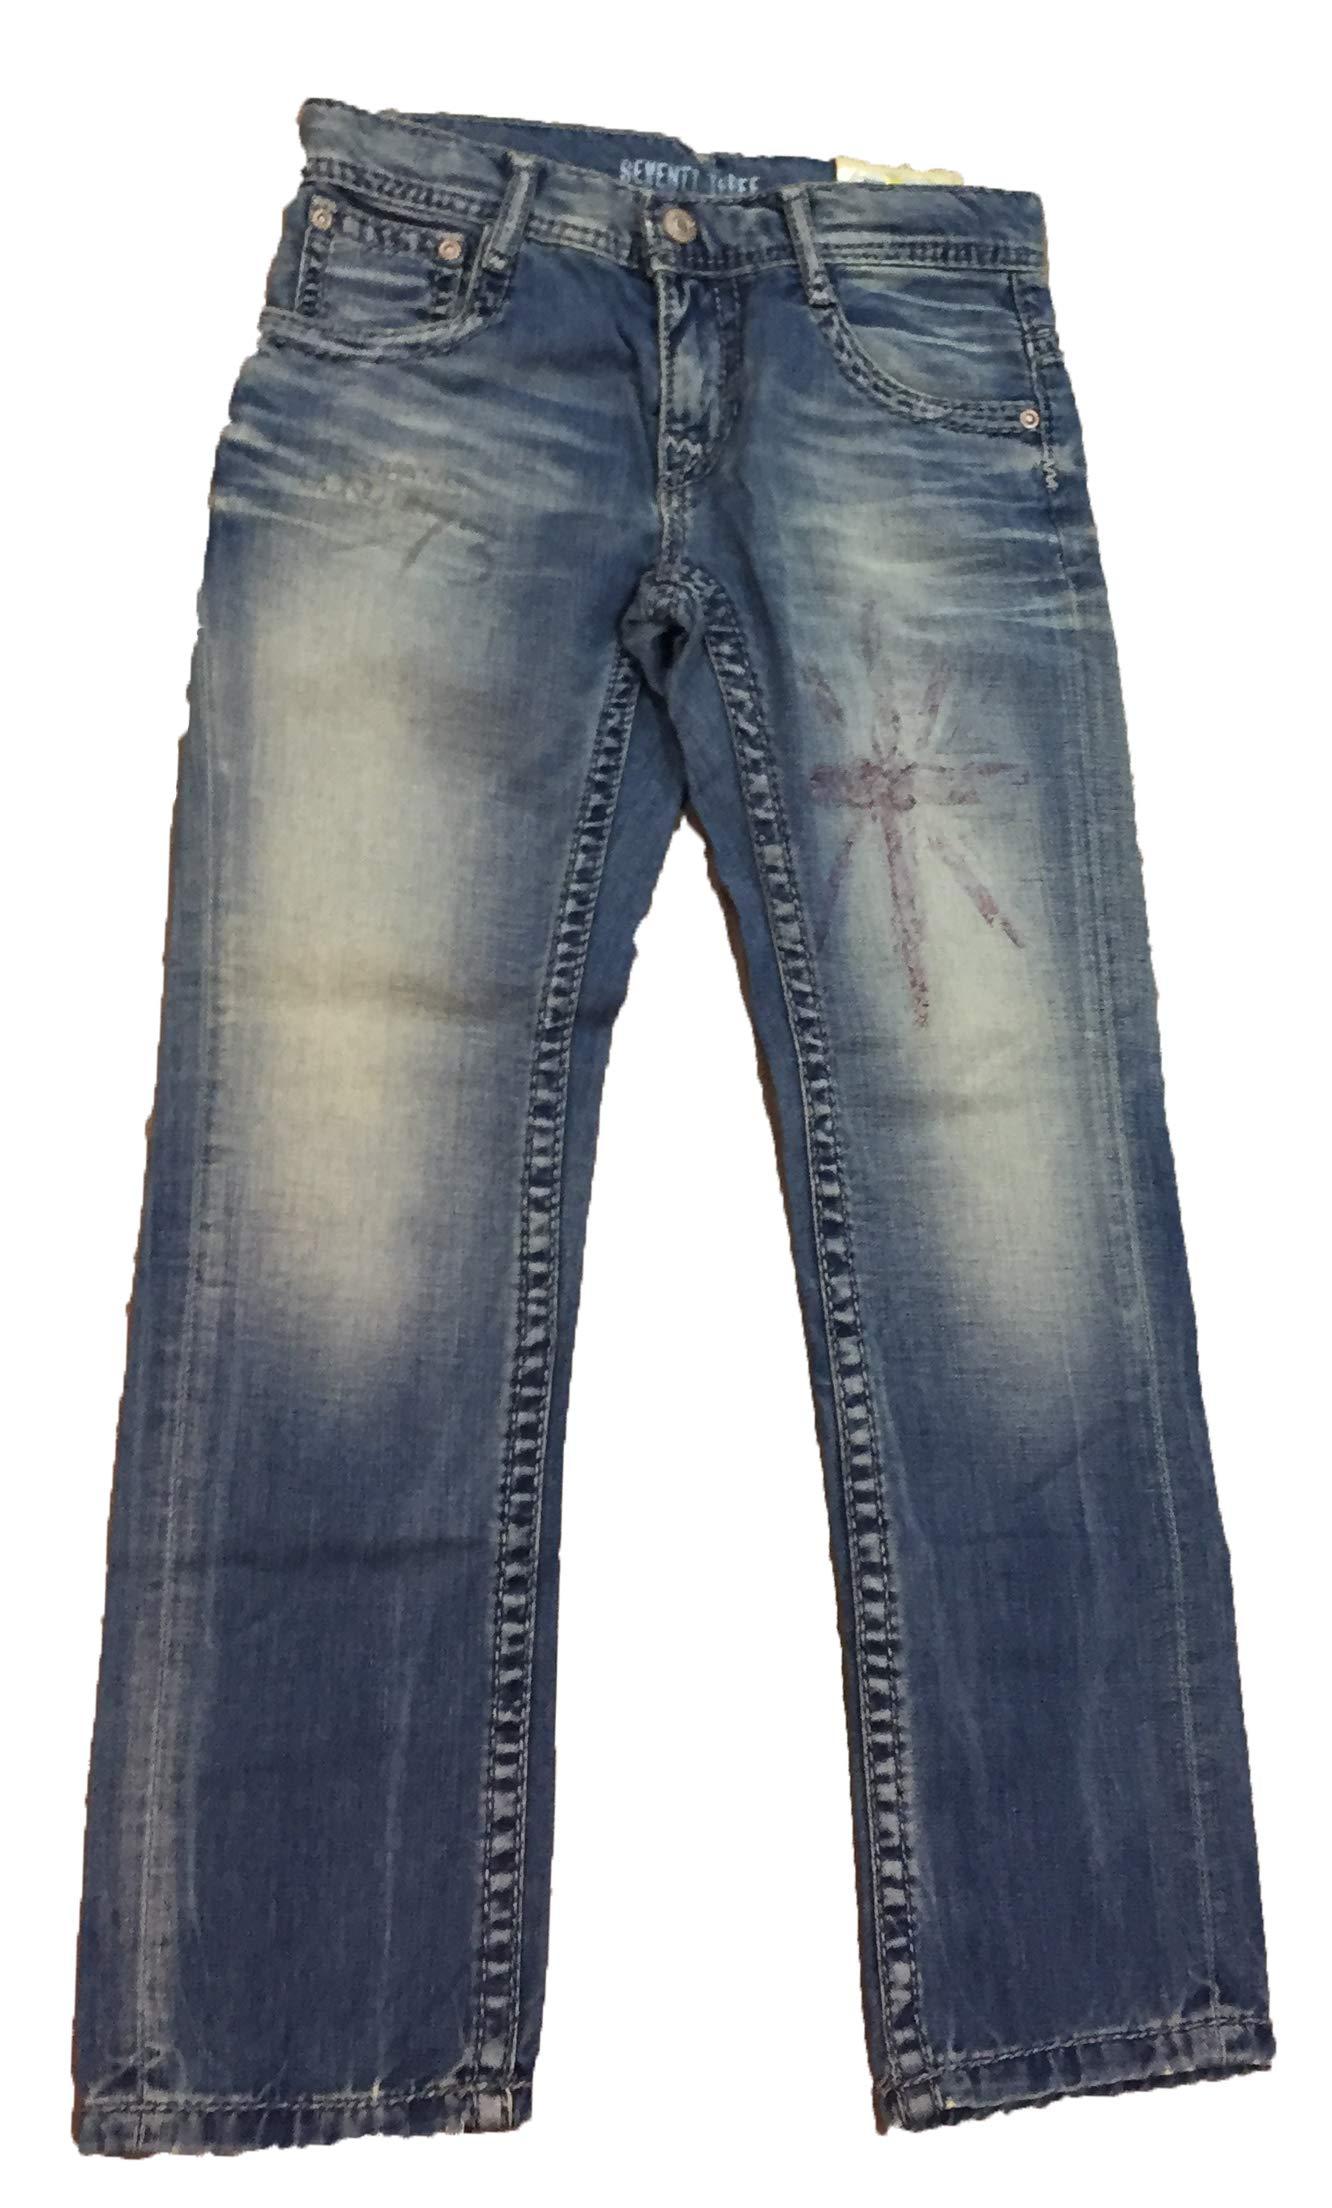 Pepe Jeans – Bulldog, Niño, Color Indigo, Talla 8